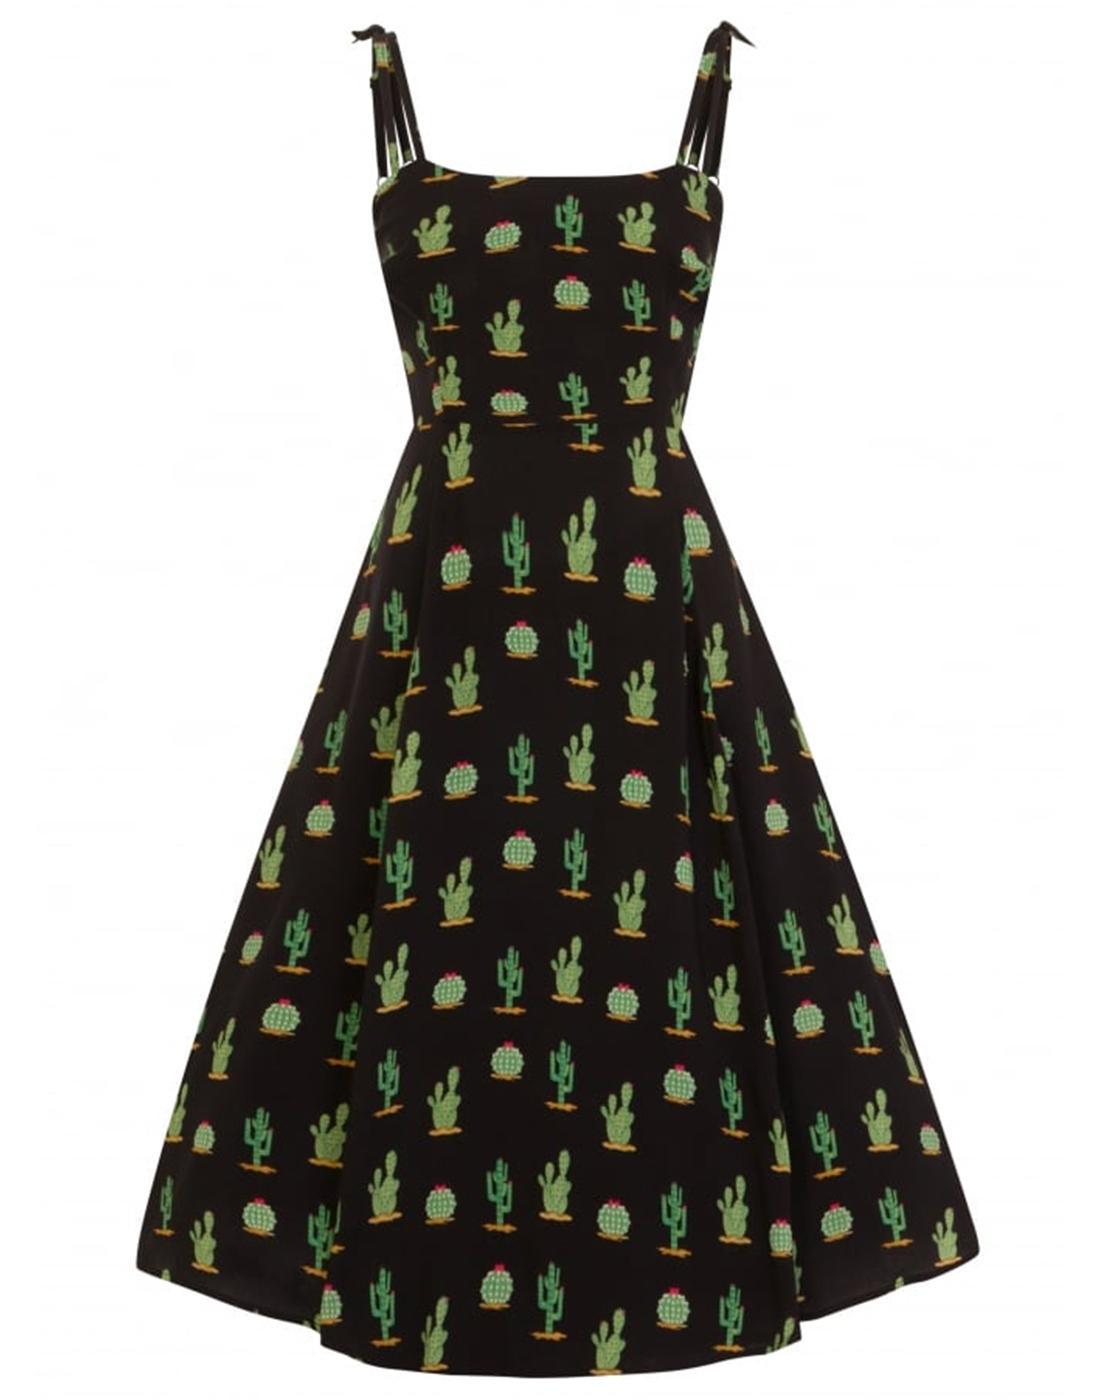 Janie COLLECTIF Retro 50s Cactus Summer Dress